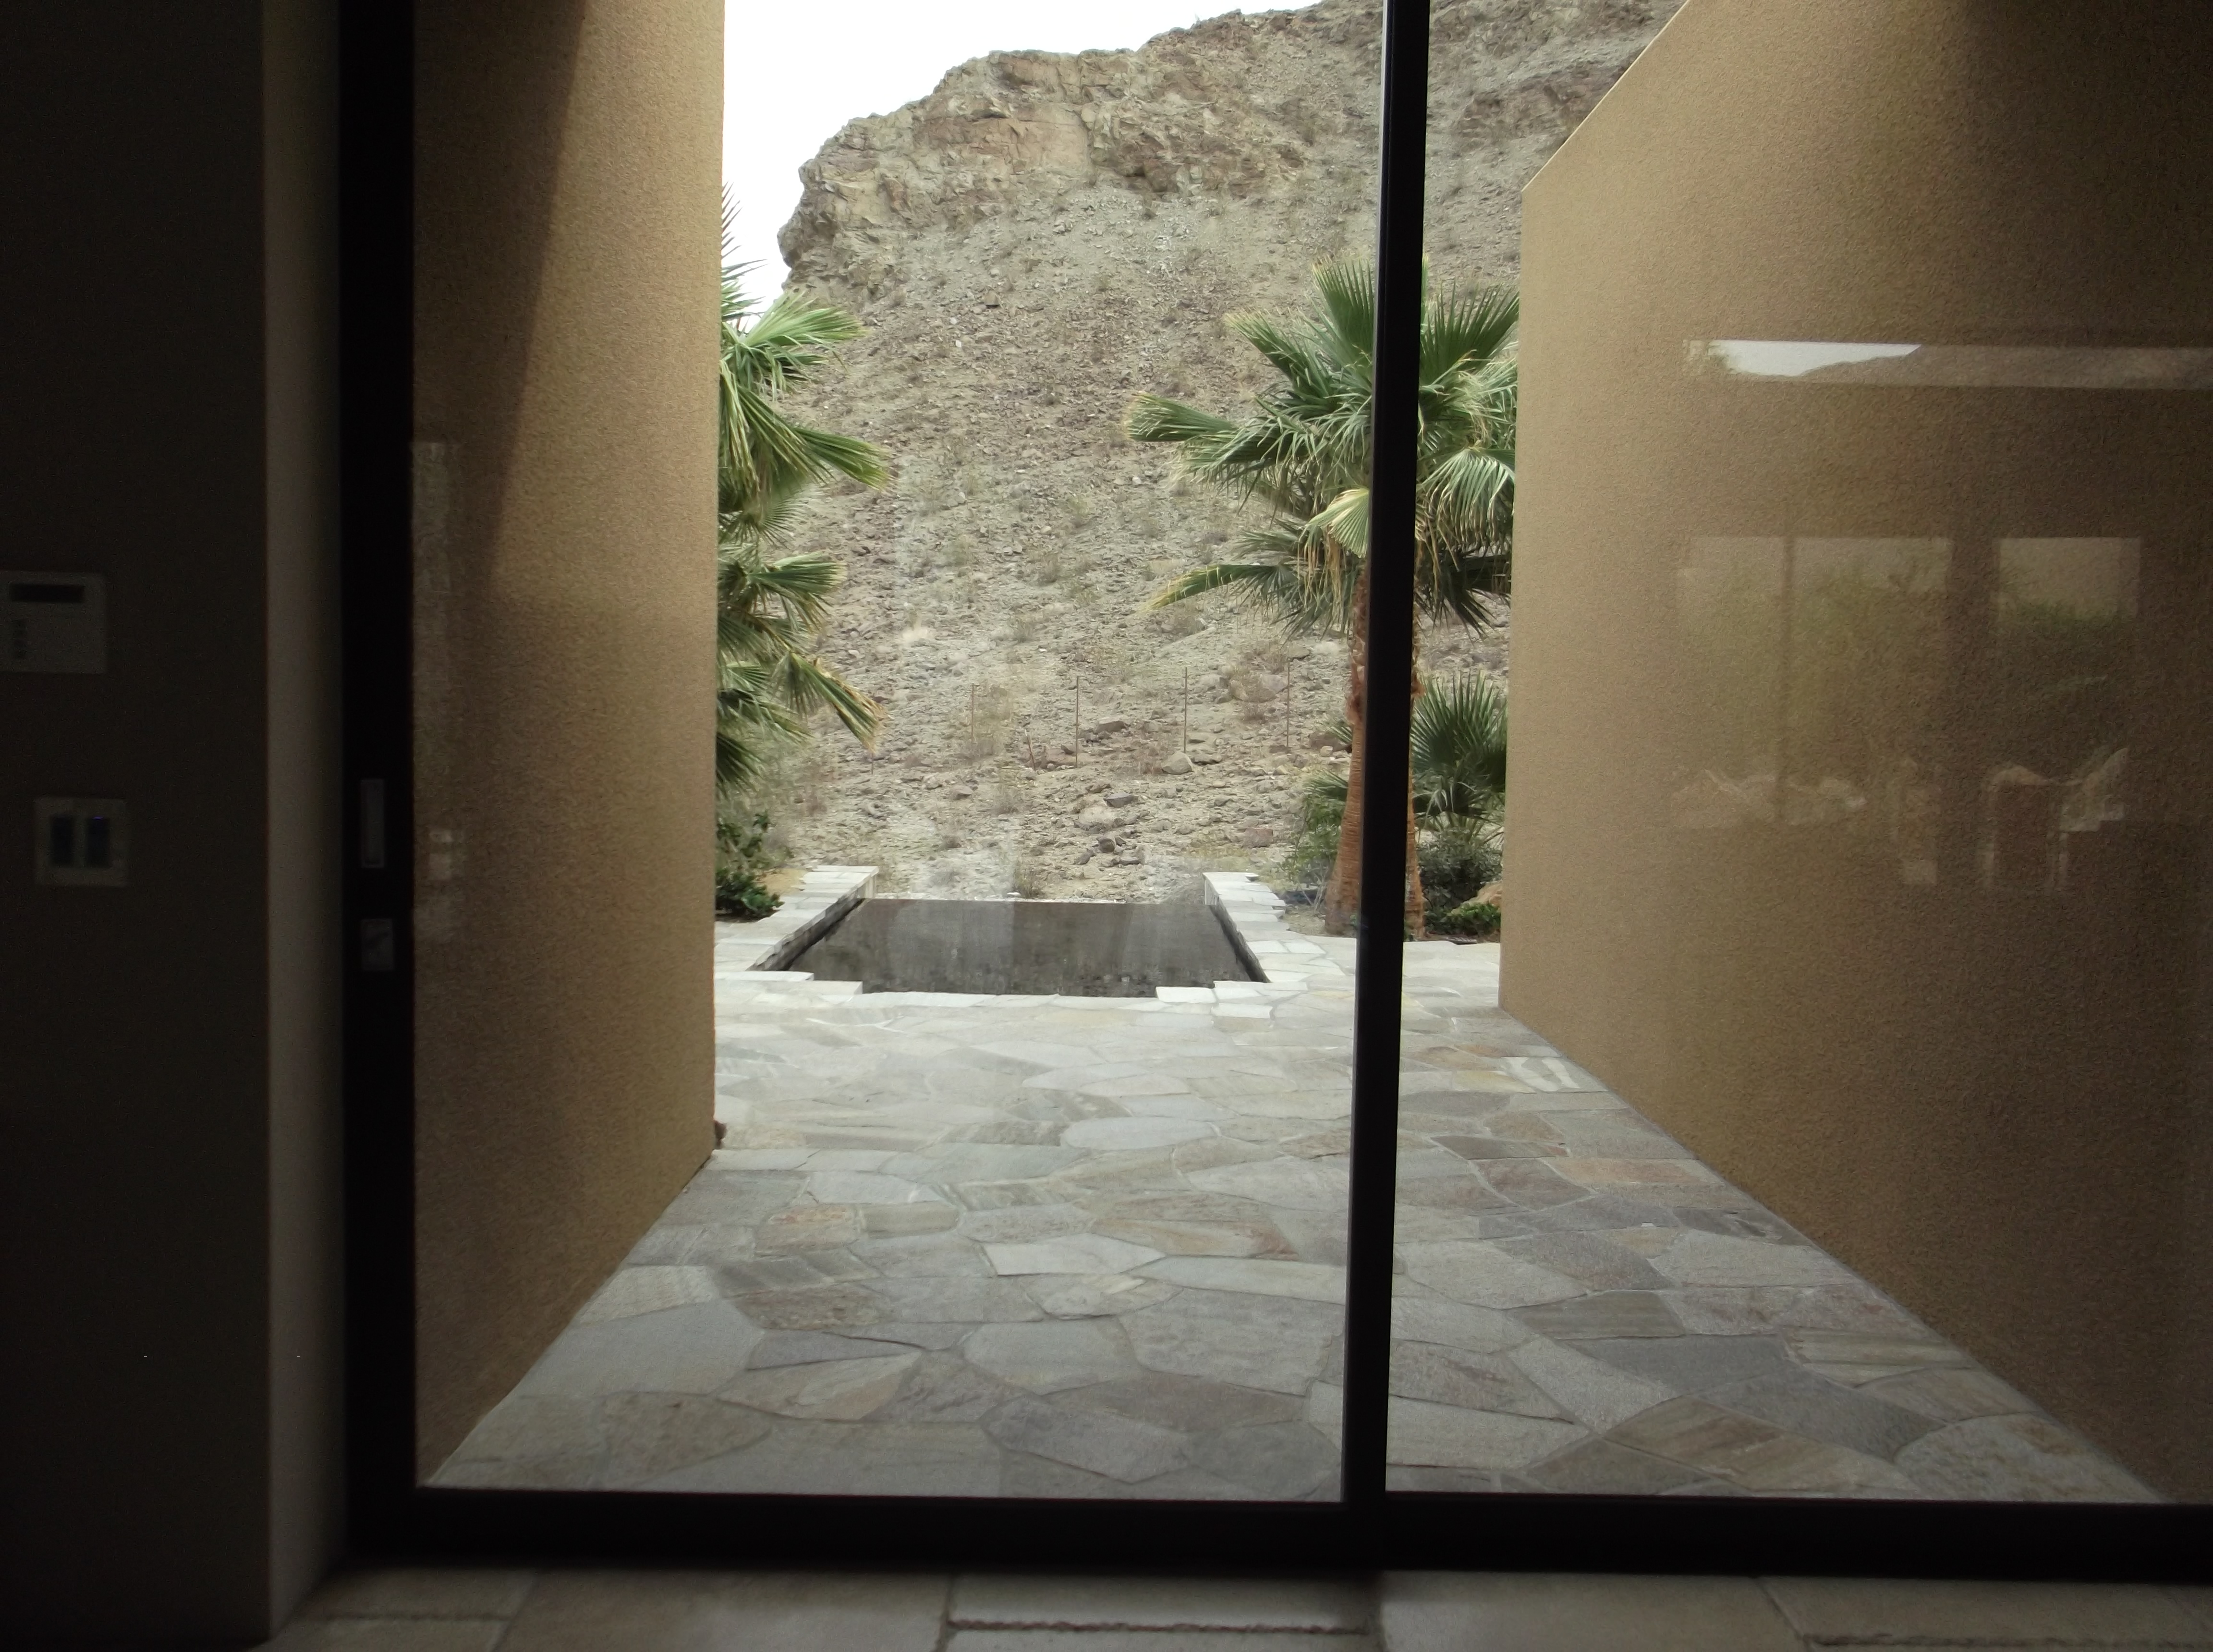 custom pools coachella valley